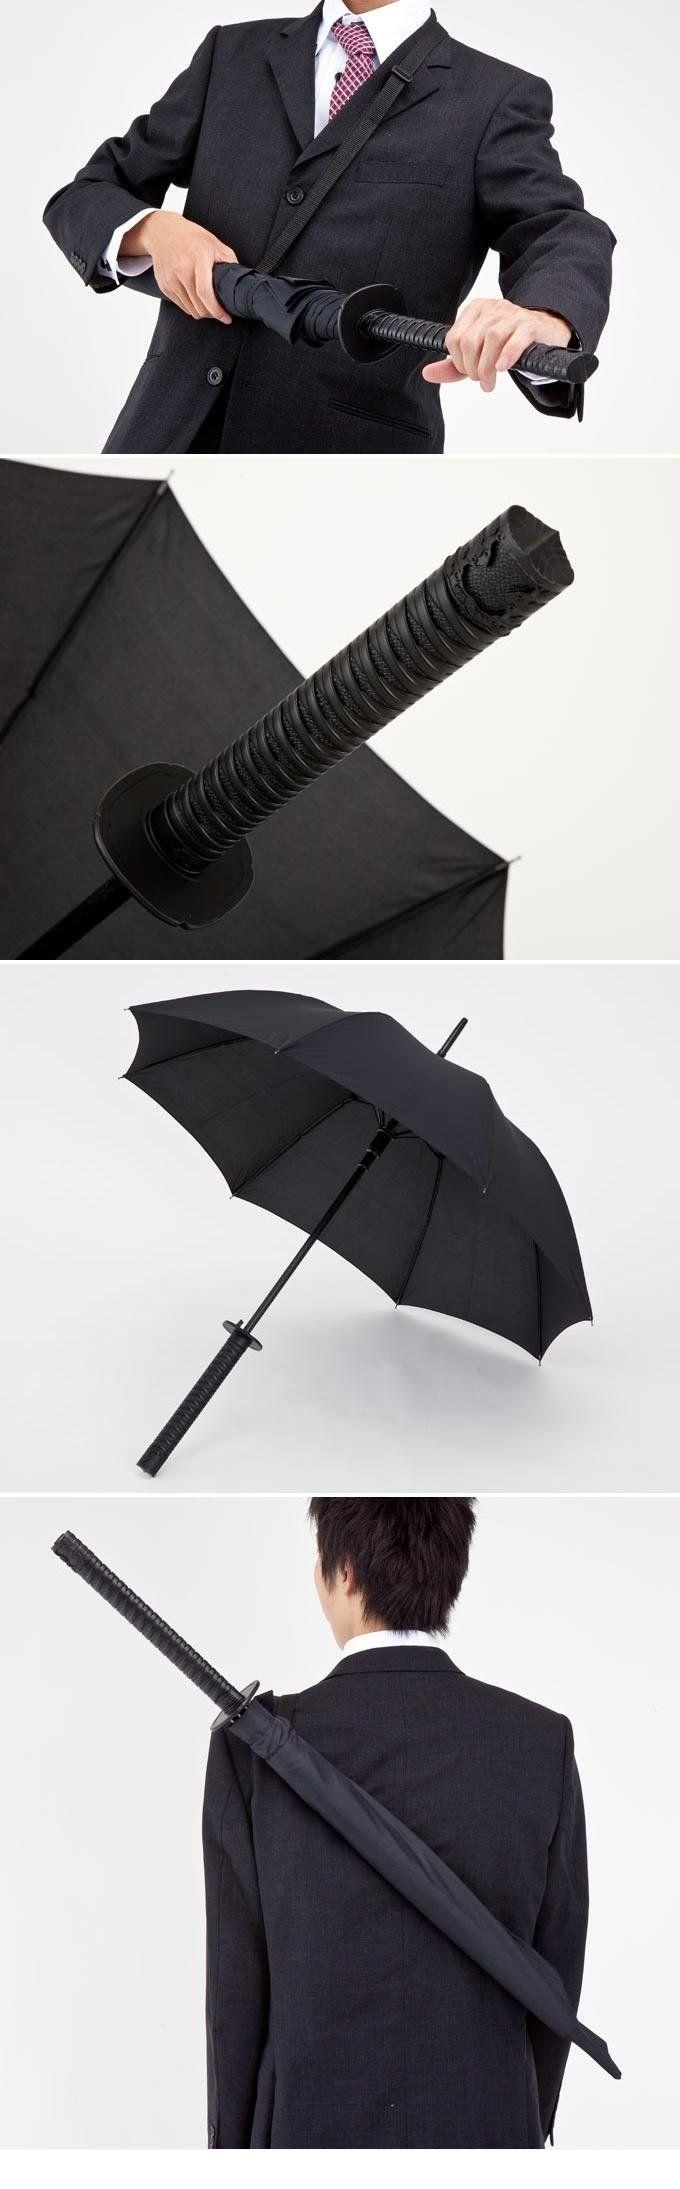 Ninja Umbrella: i need this NOW!!